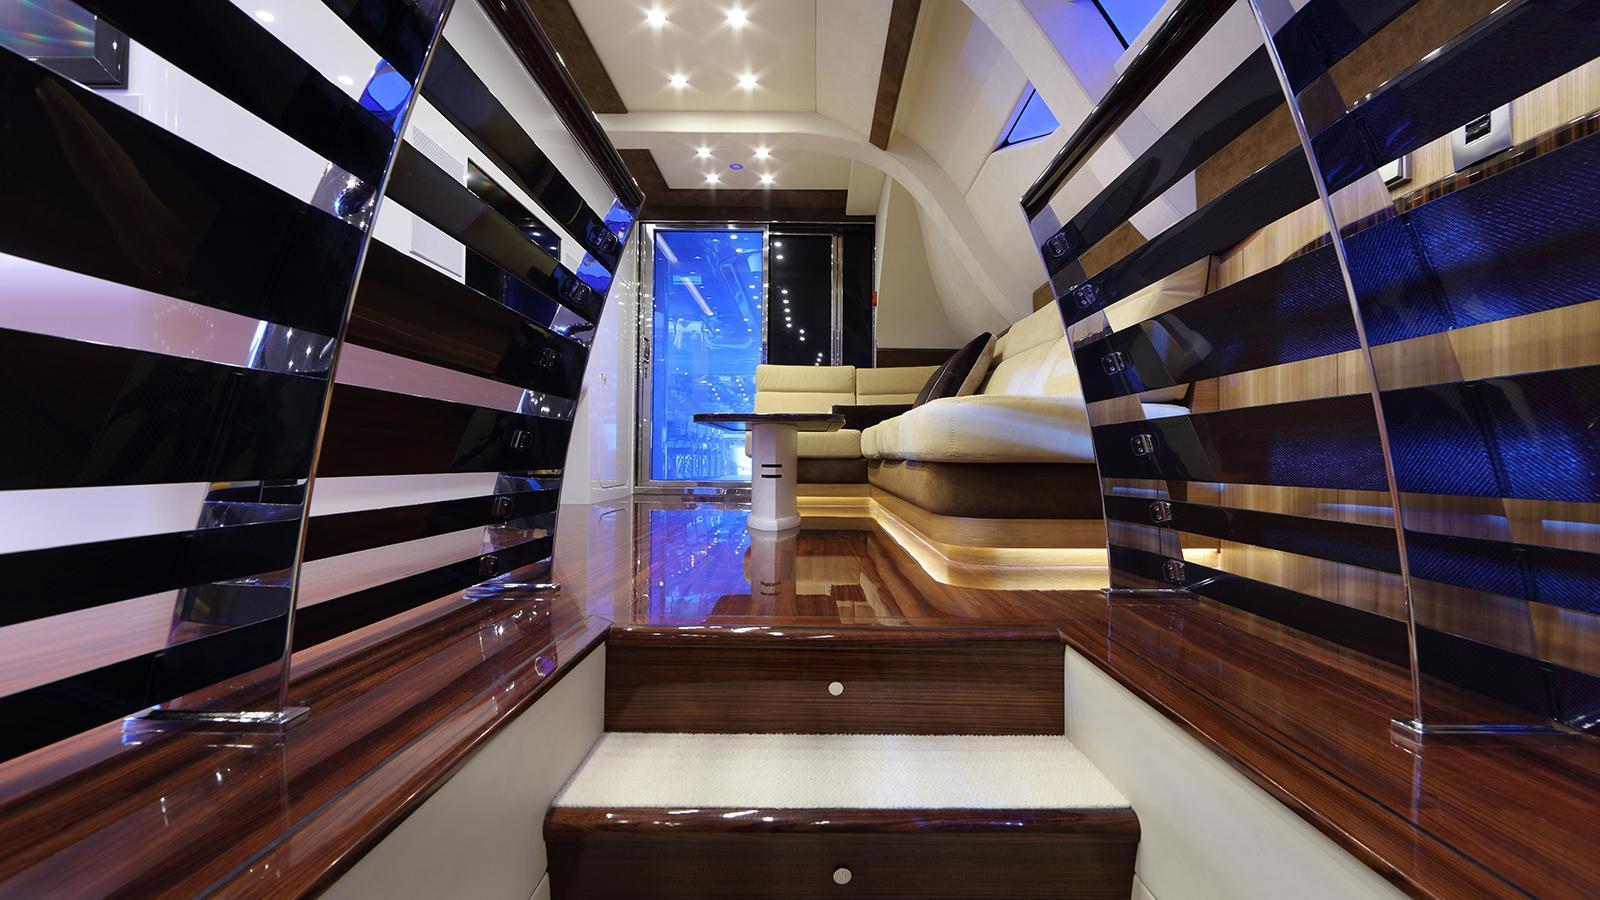 galaxy of happiness trimaran yacht latitude 2016 53m media lounge